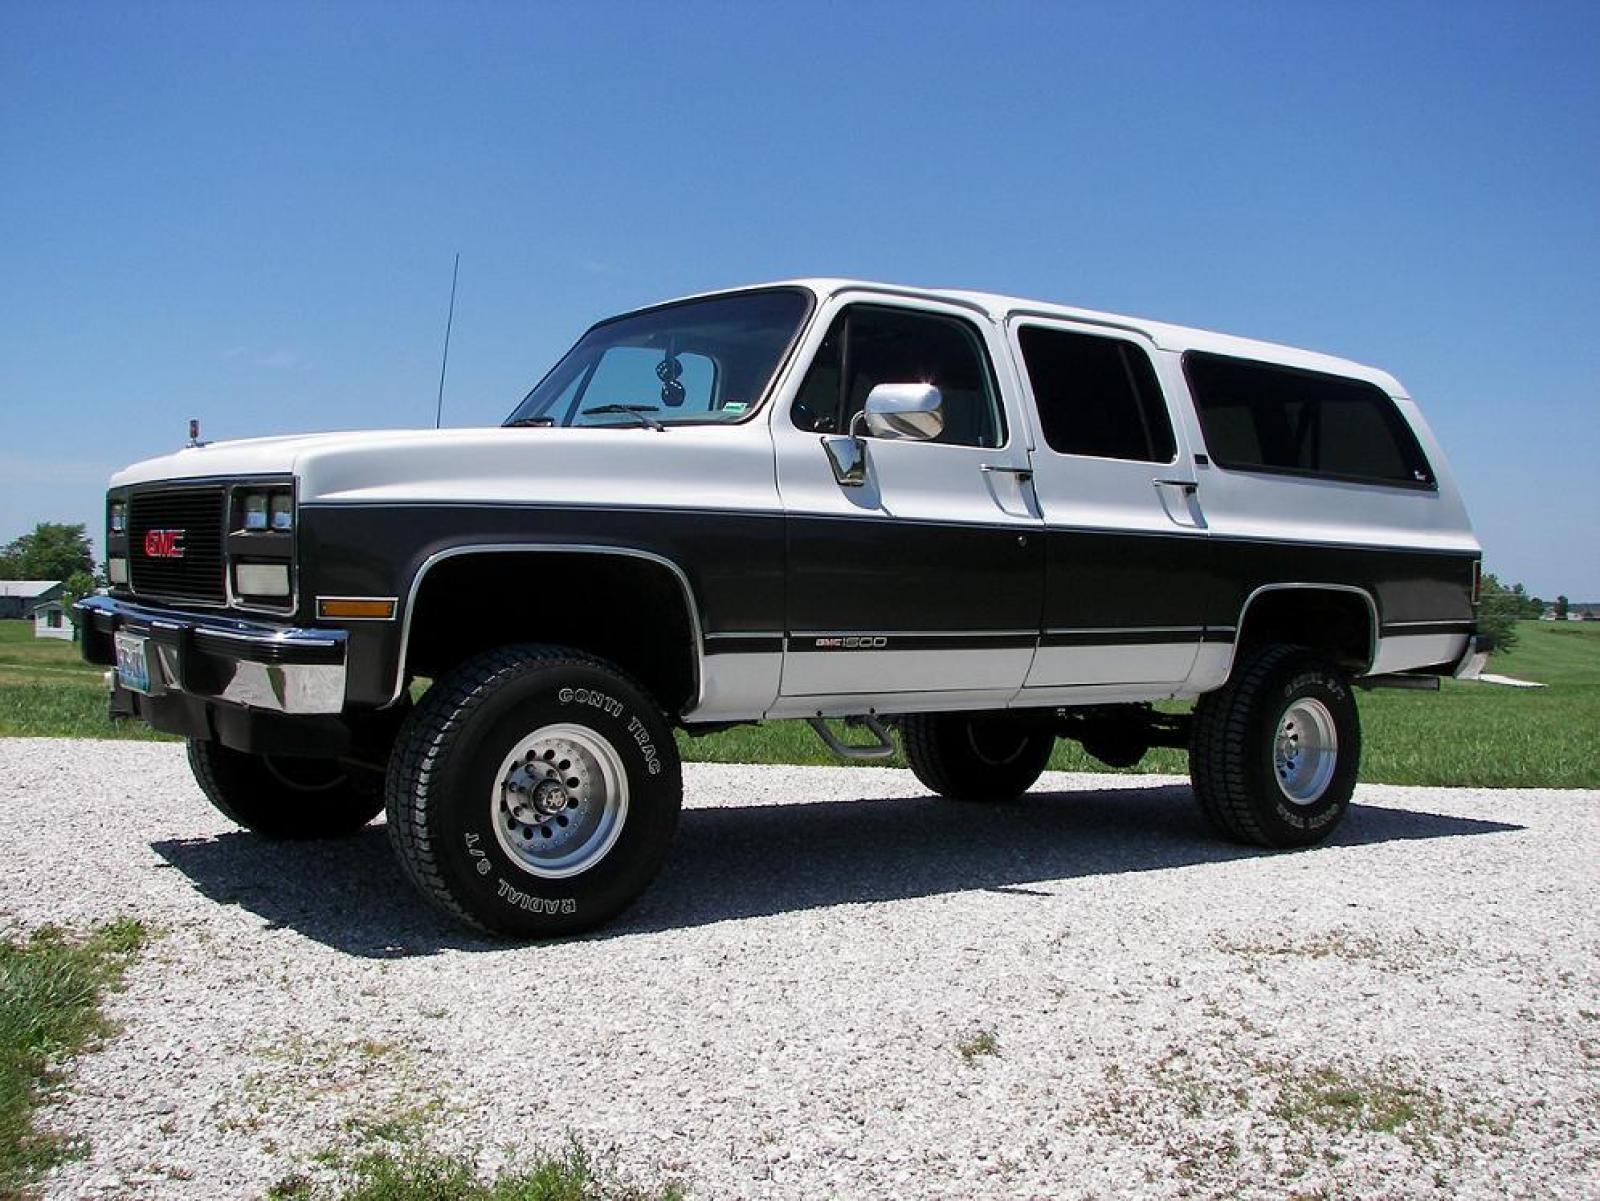 1991 Gmc Suburban Truck Yukon Wiring1991 1600px Image 10 Rh Zombdrive Com 1500